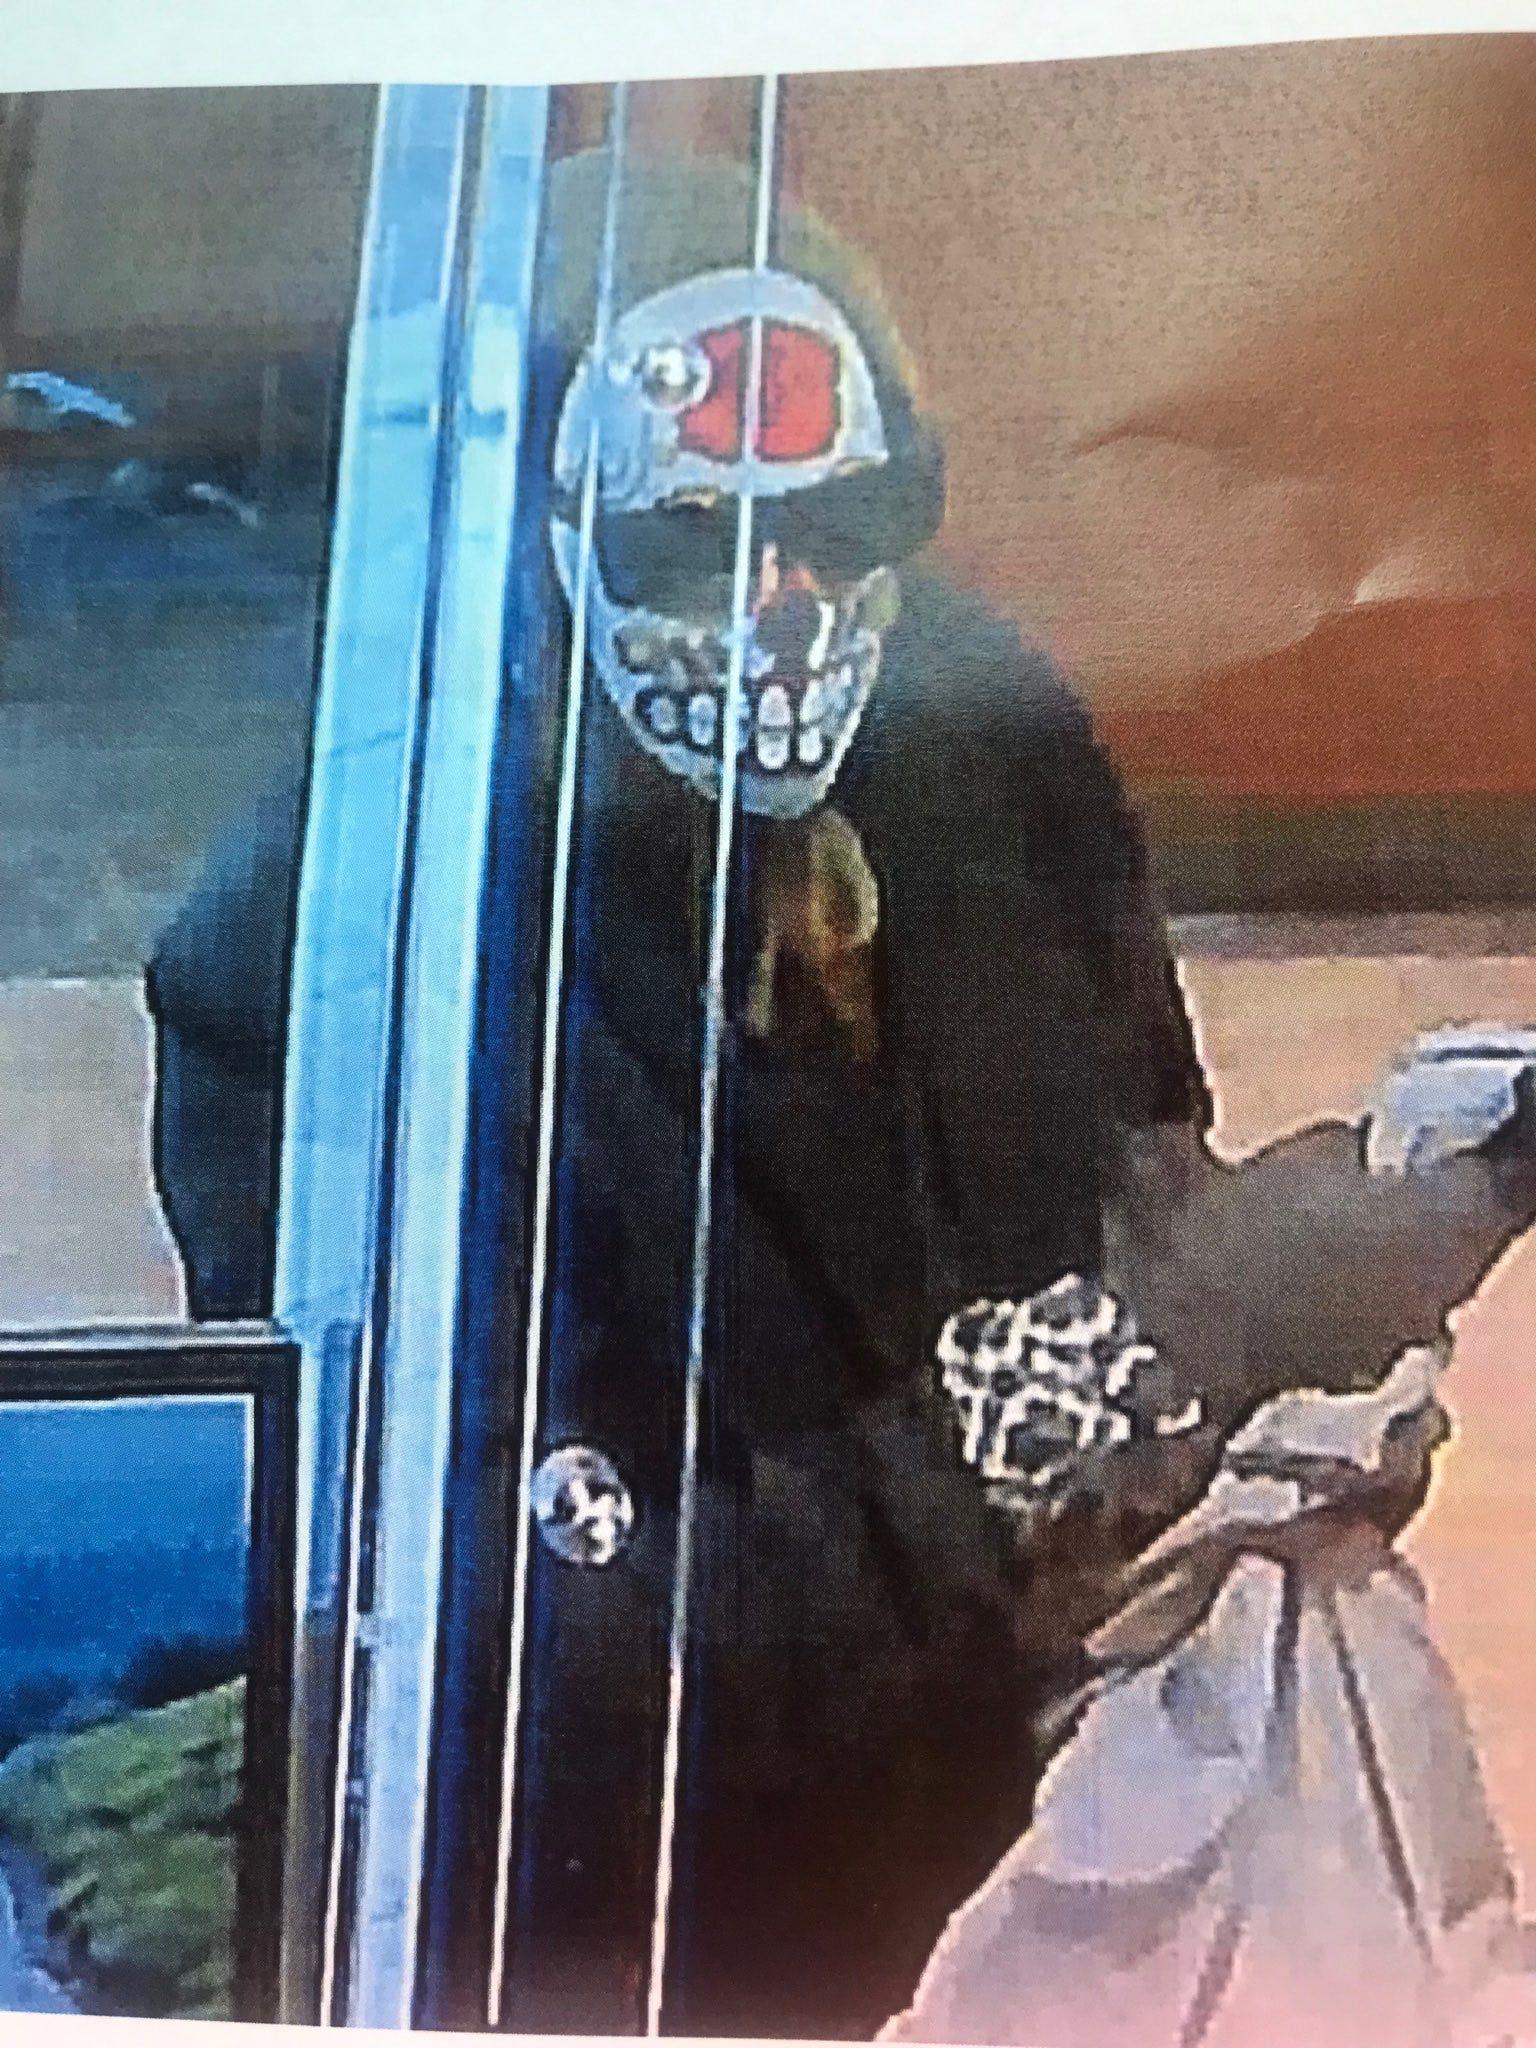 Brazen armed bank robbery on high-end Santa Monica street, suspect on loose